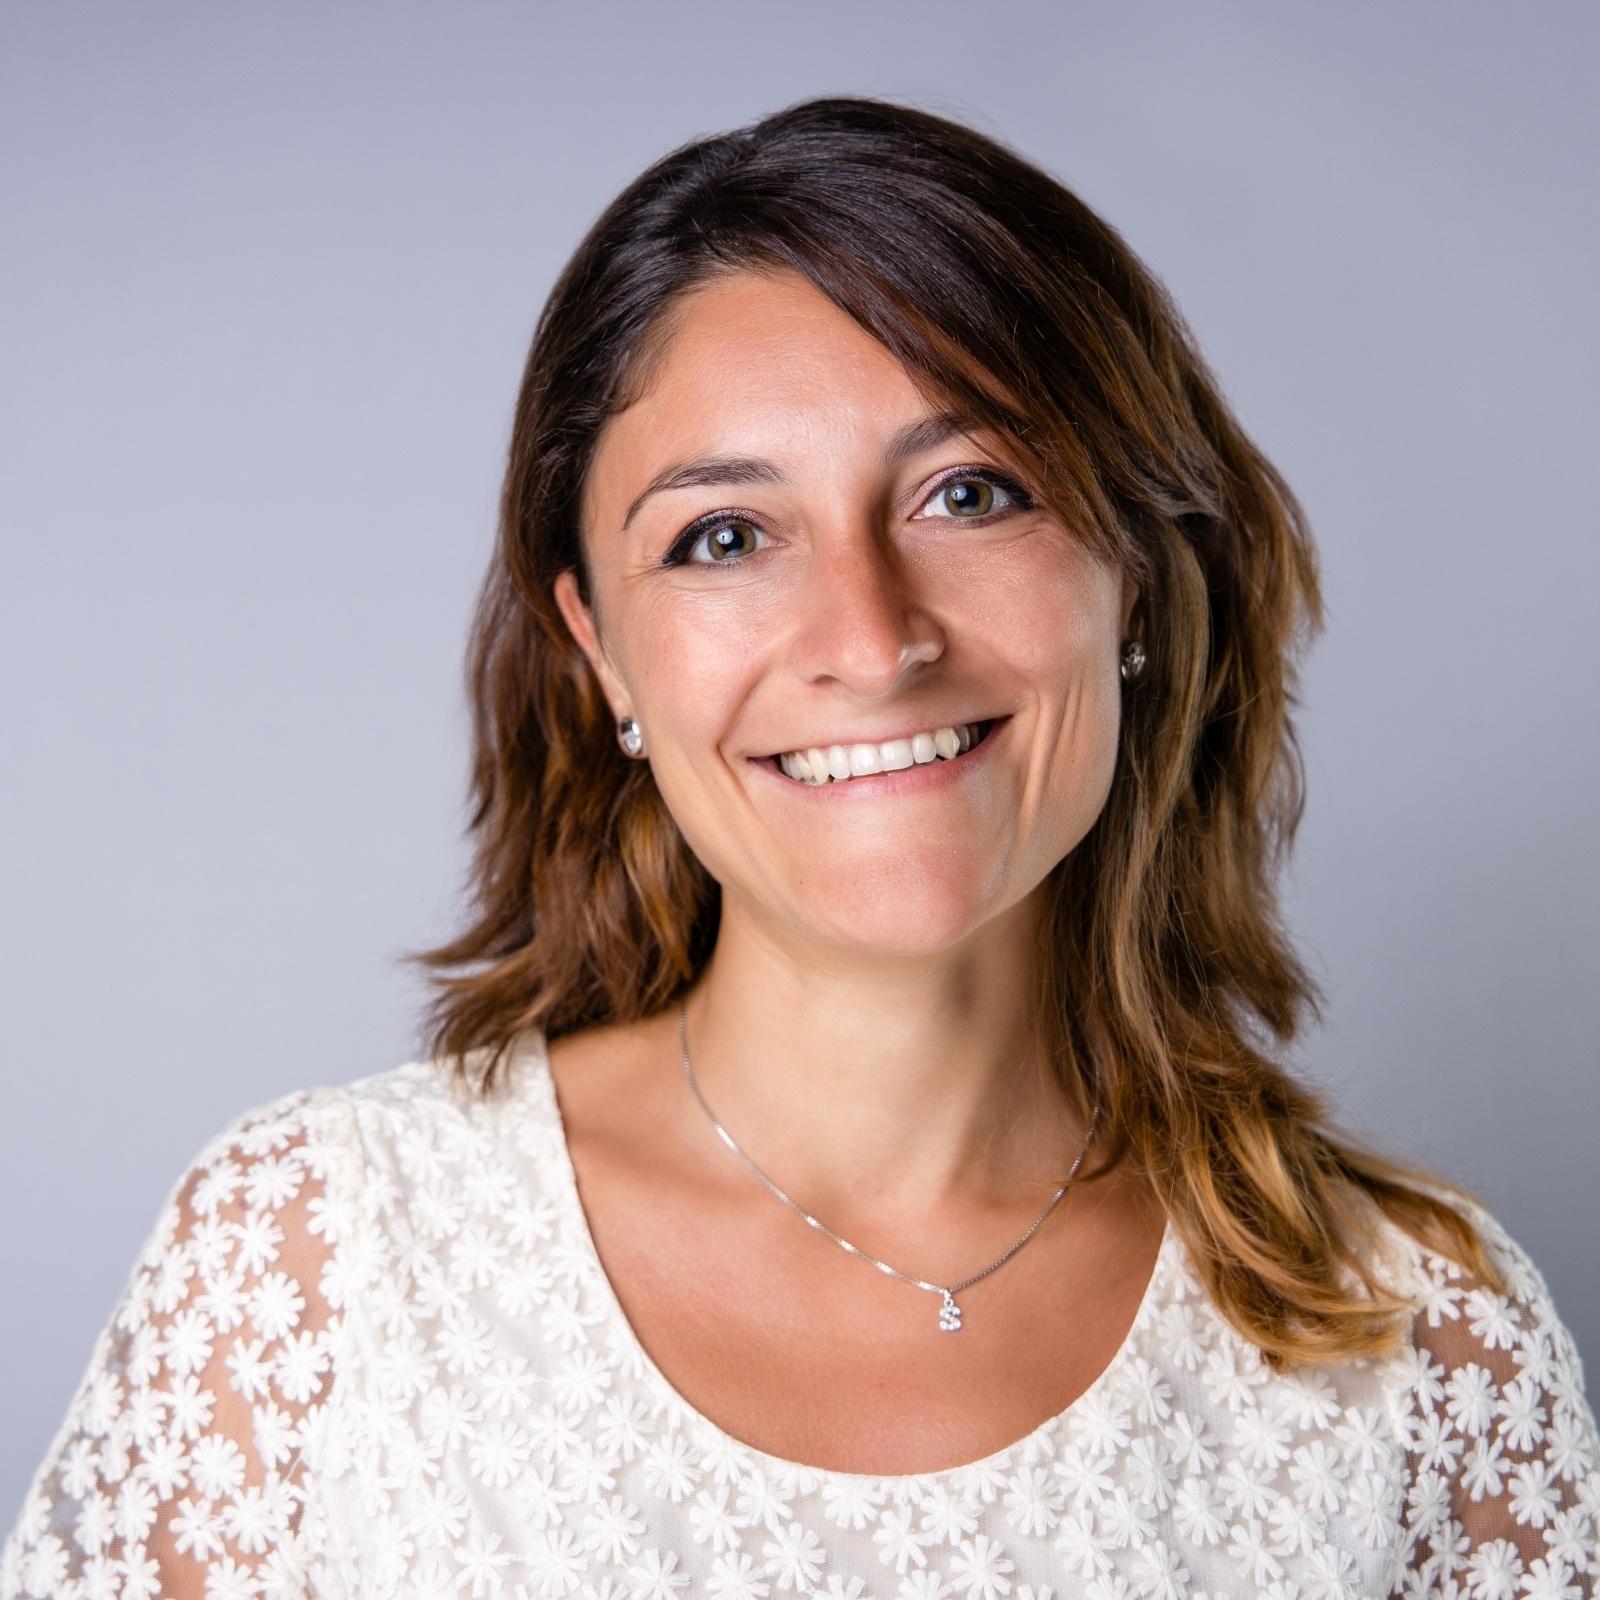 Sara Ricciardi